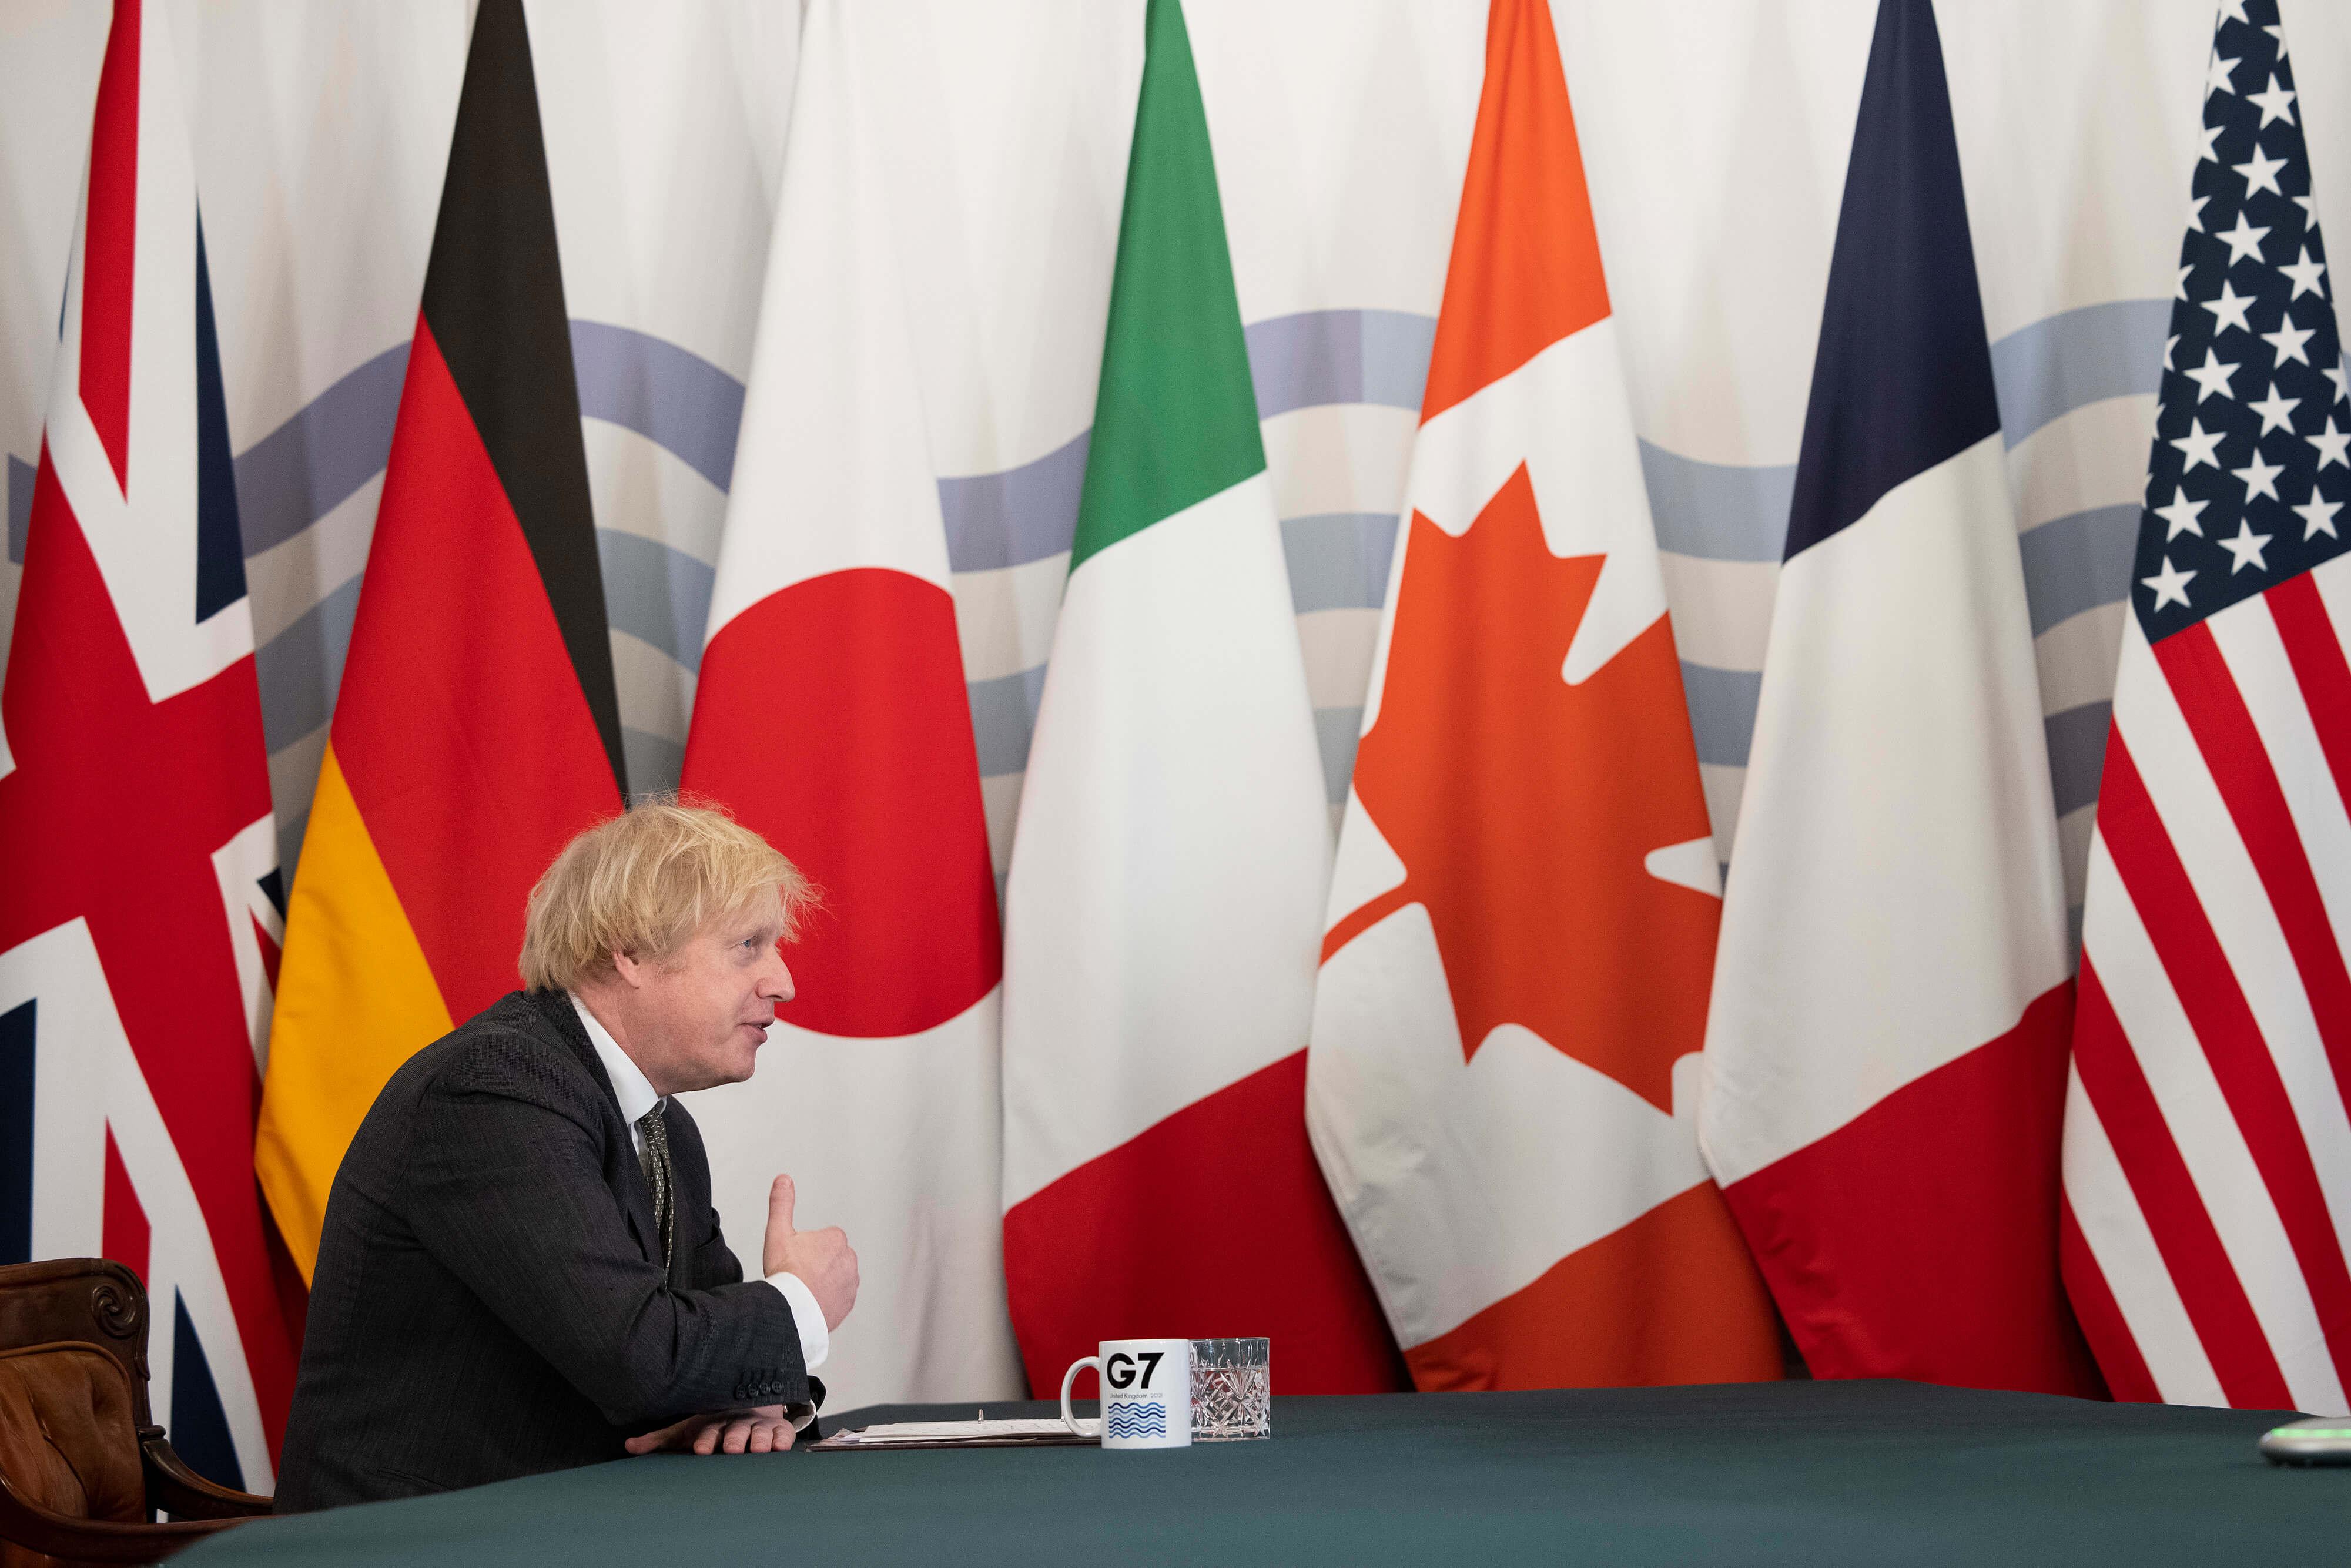 Simon Dawson/No 10 Downing Stree/Global Look Press